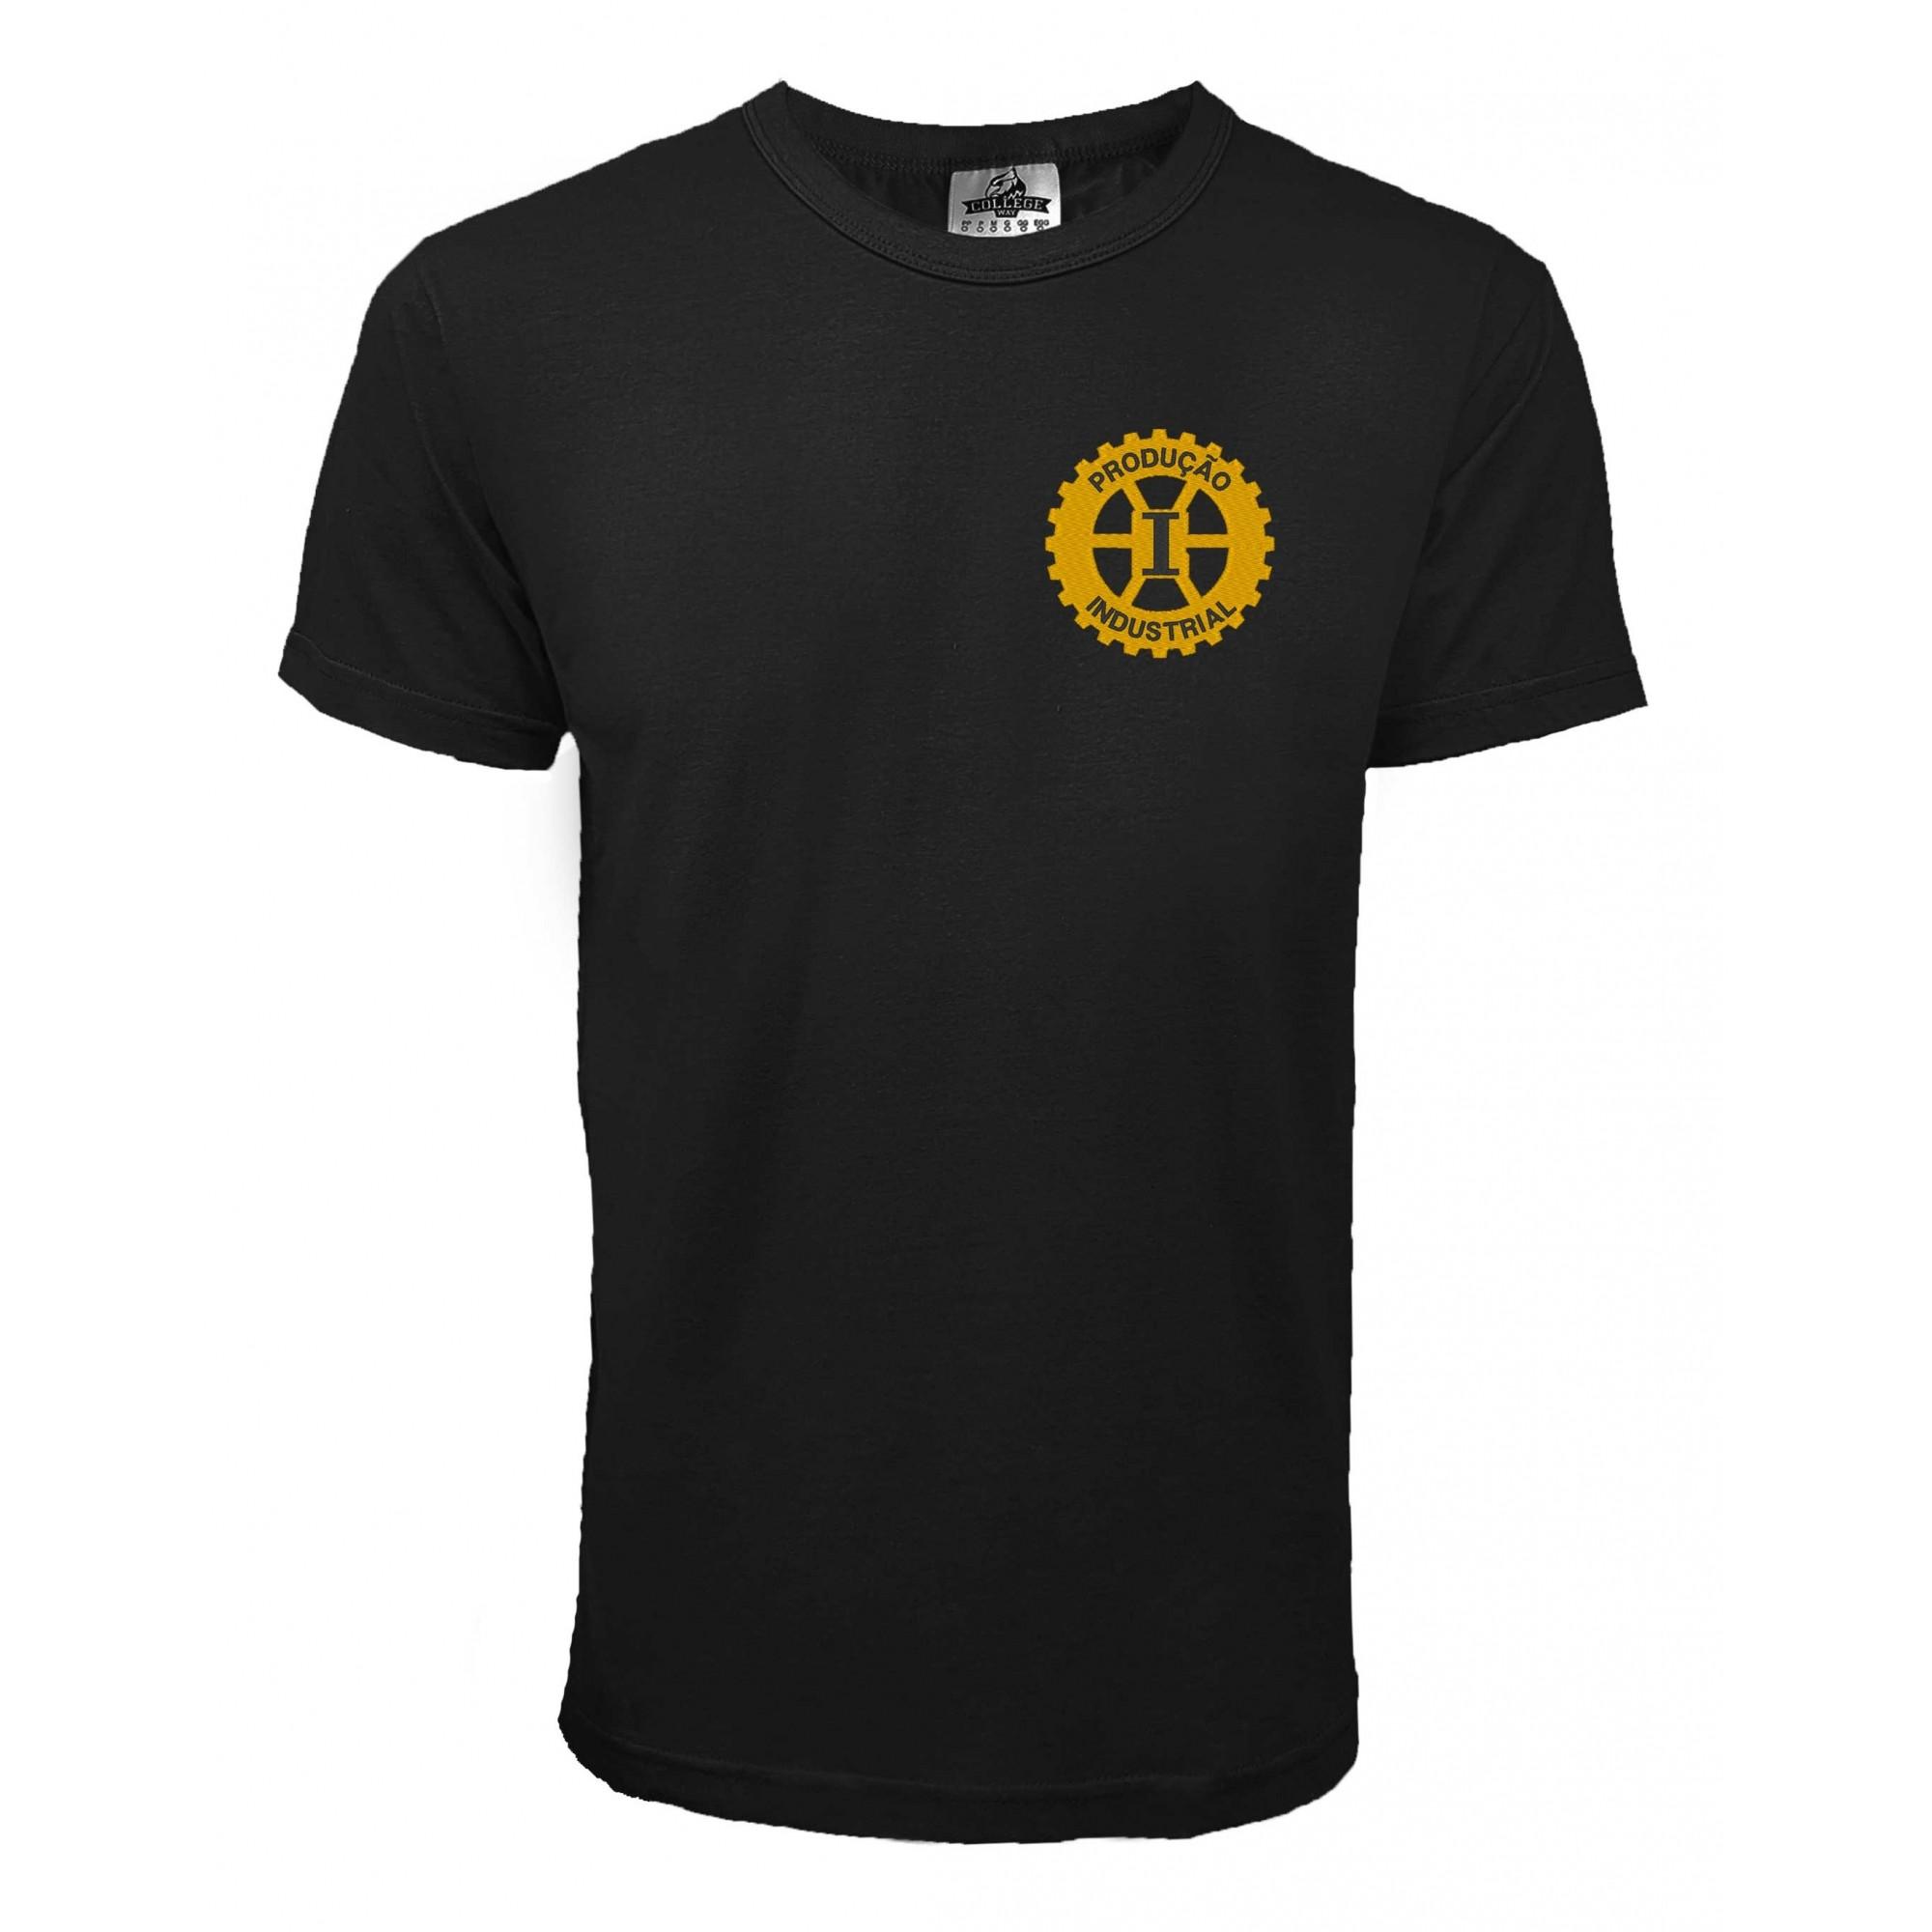 Camiseta Produção Industrial Bordada